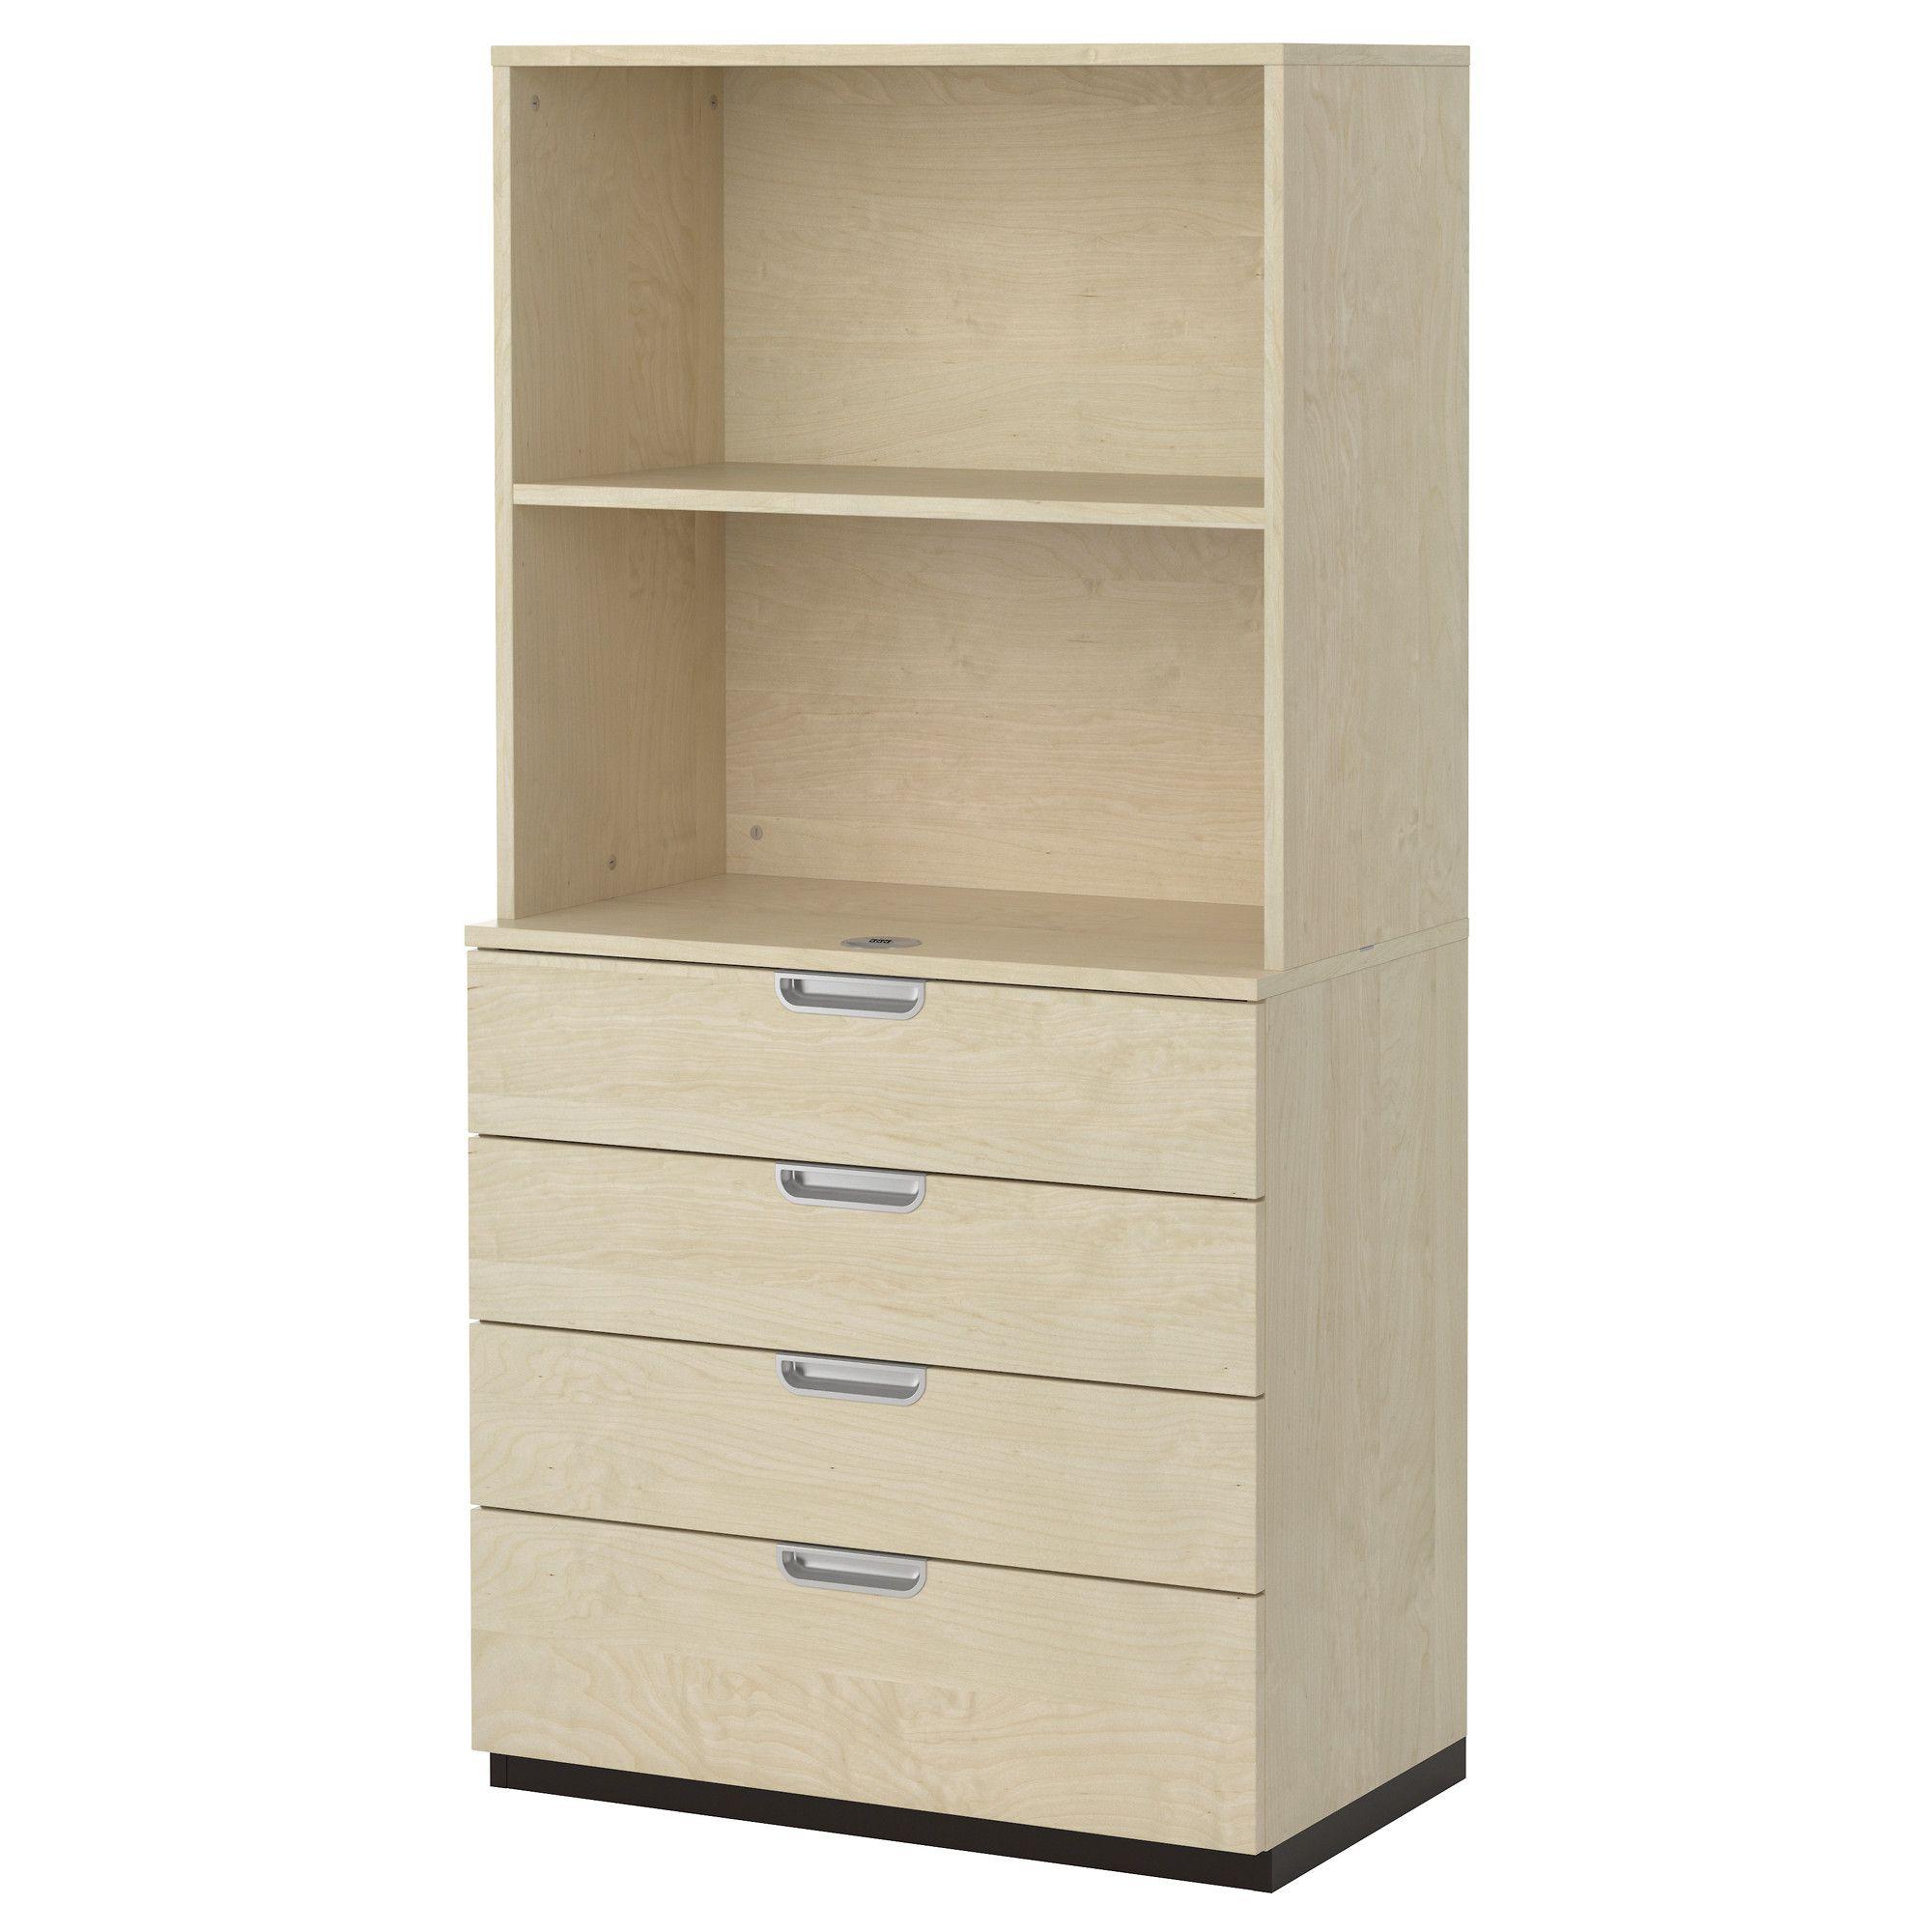 ikea office drawers. GALANT Storage Combination With Drawers - Birch Veneer IKEA Ikea Office C